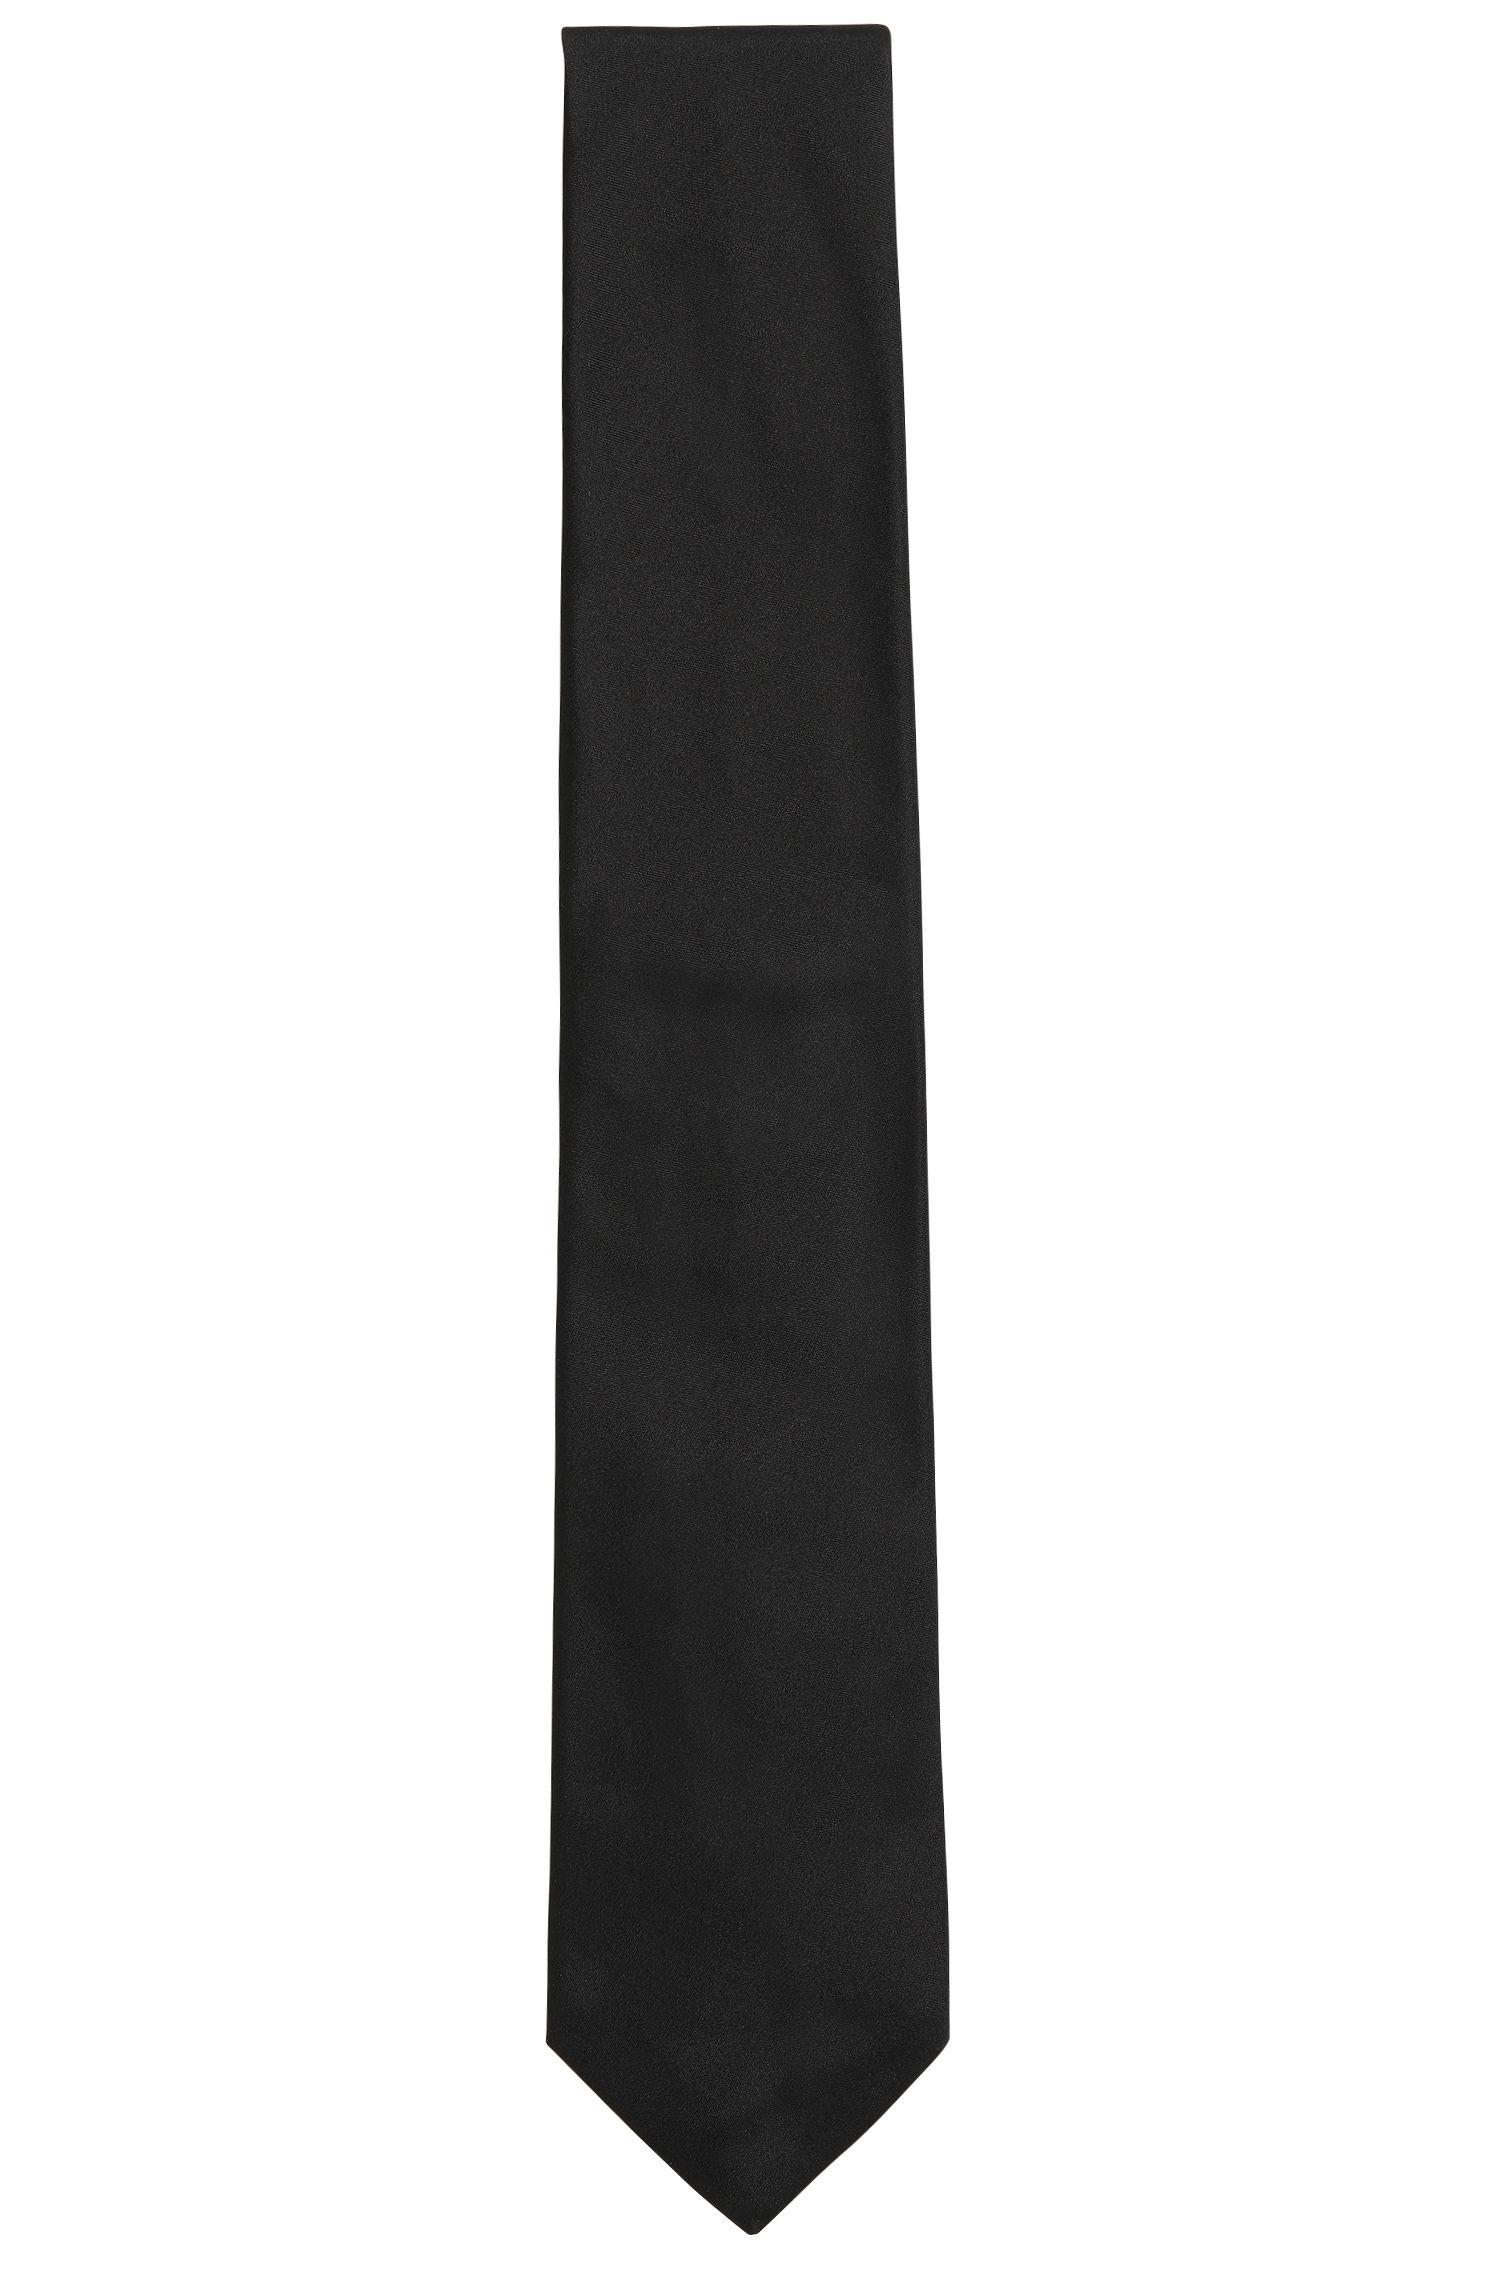 Italian Silk Tie, Black